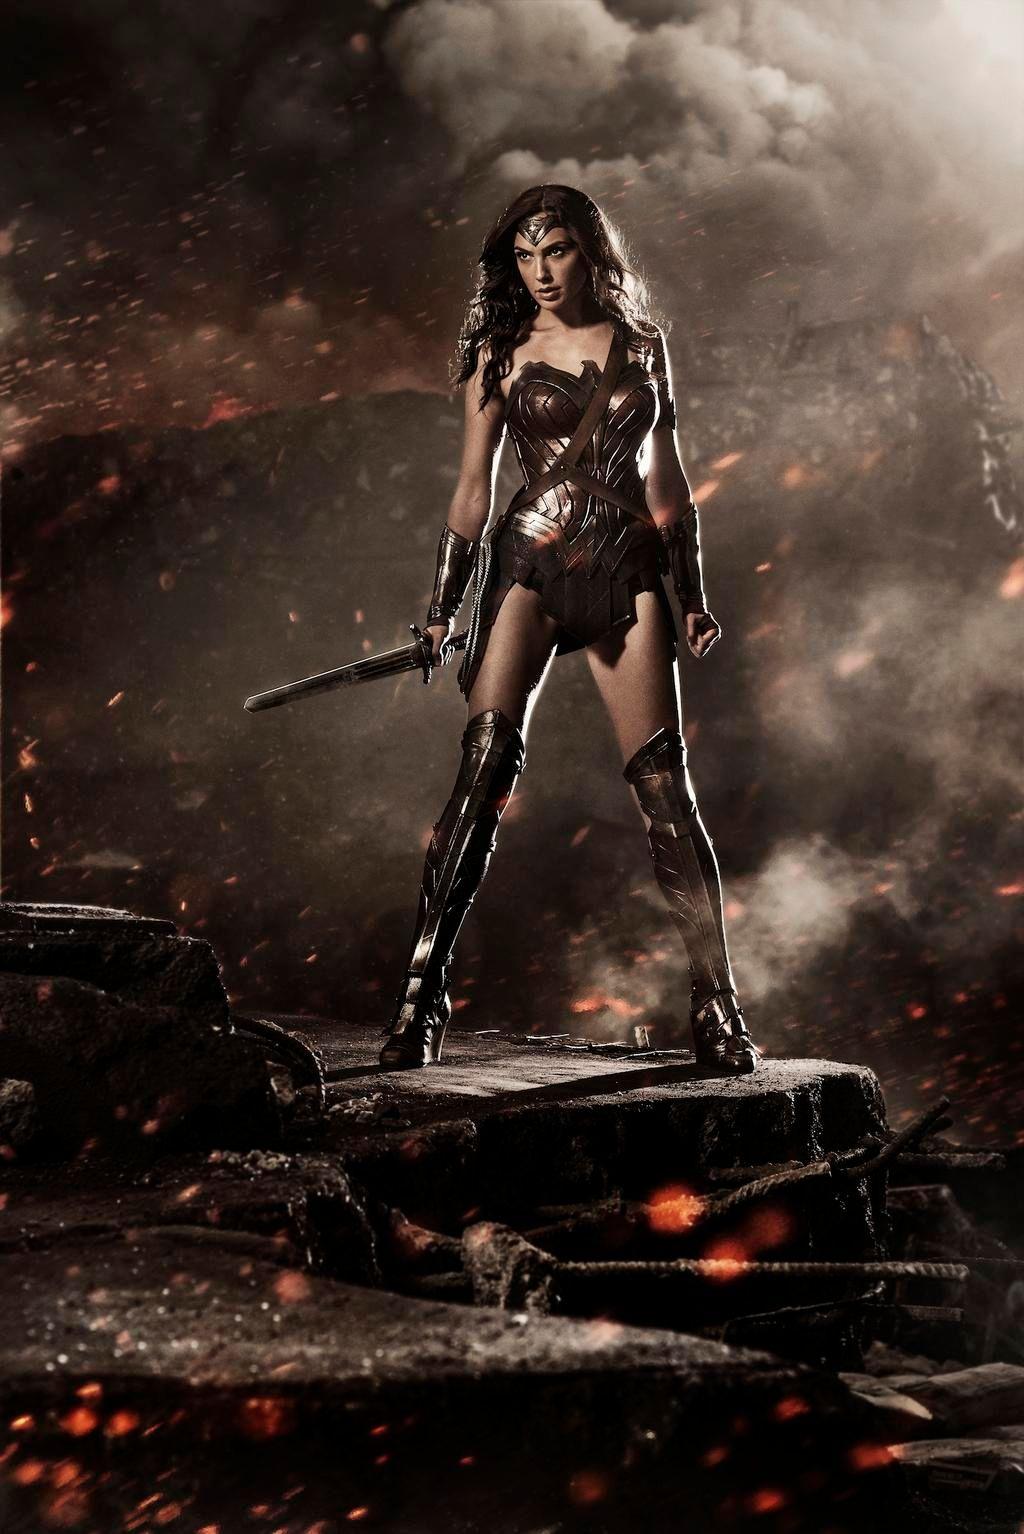 Wonder Woman's Origin in 'Batman v Superman' Revealed